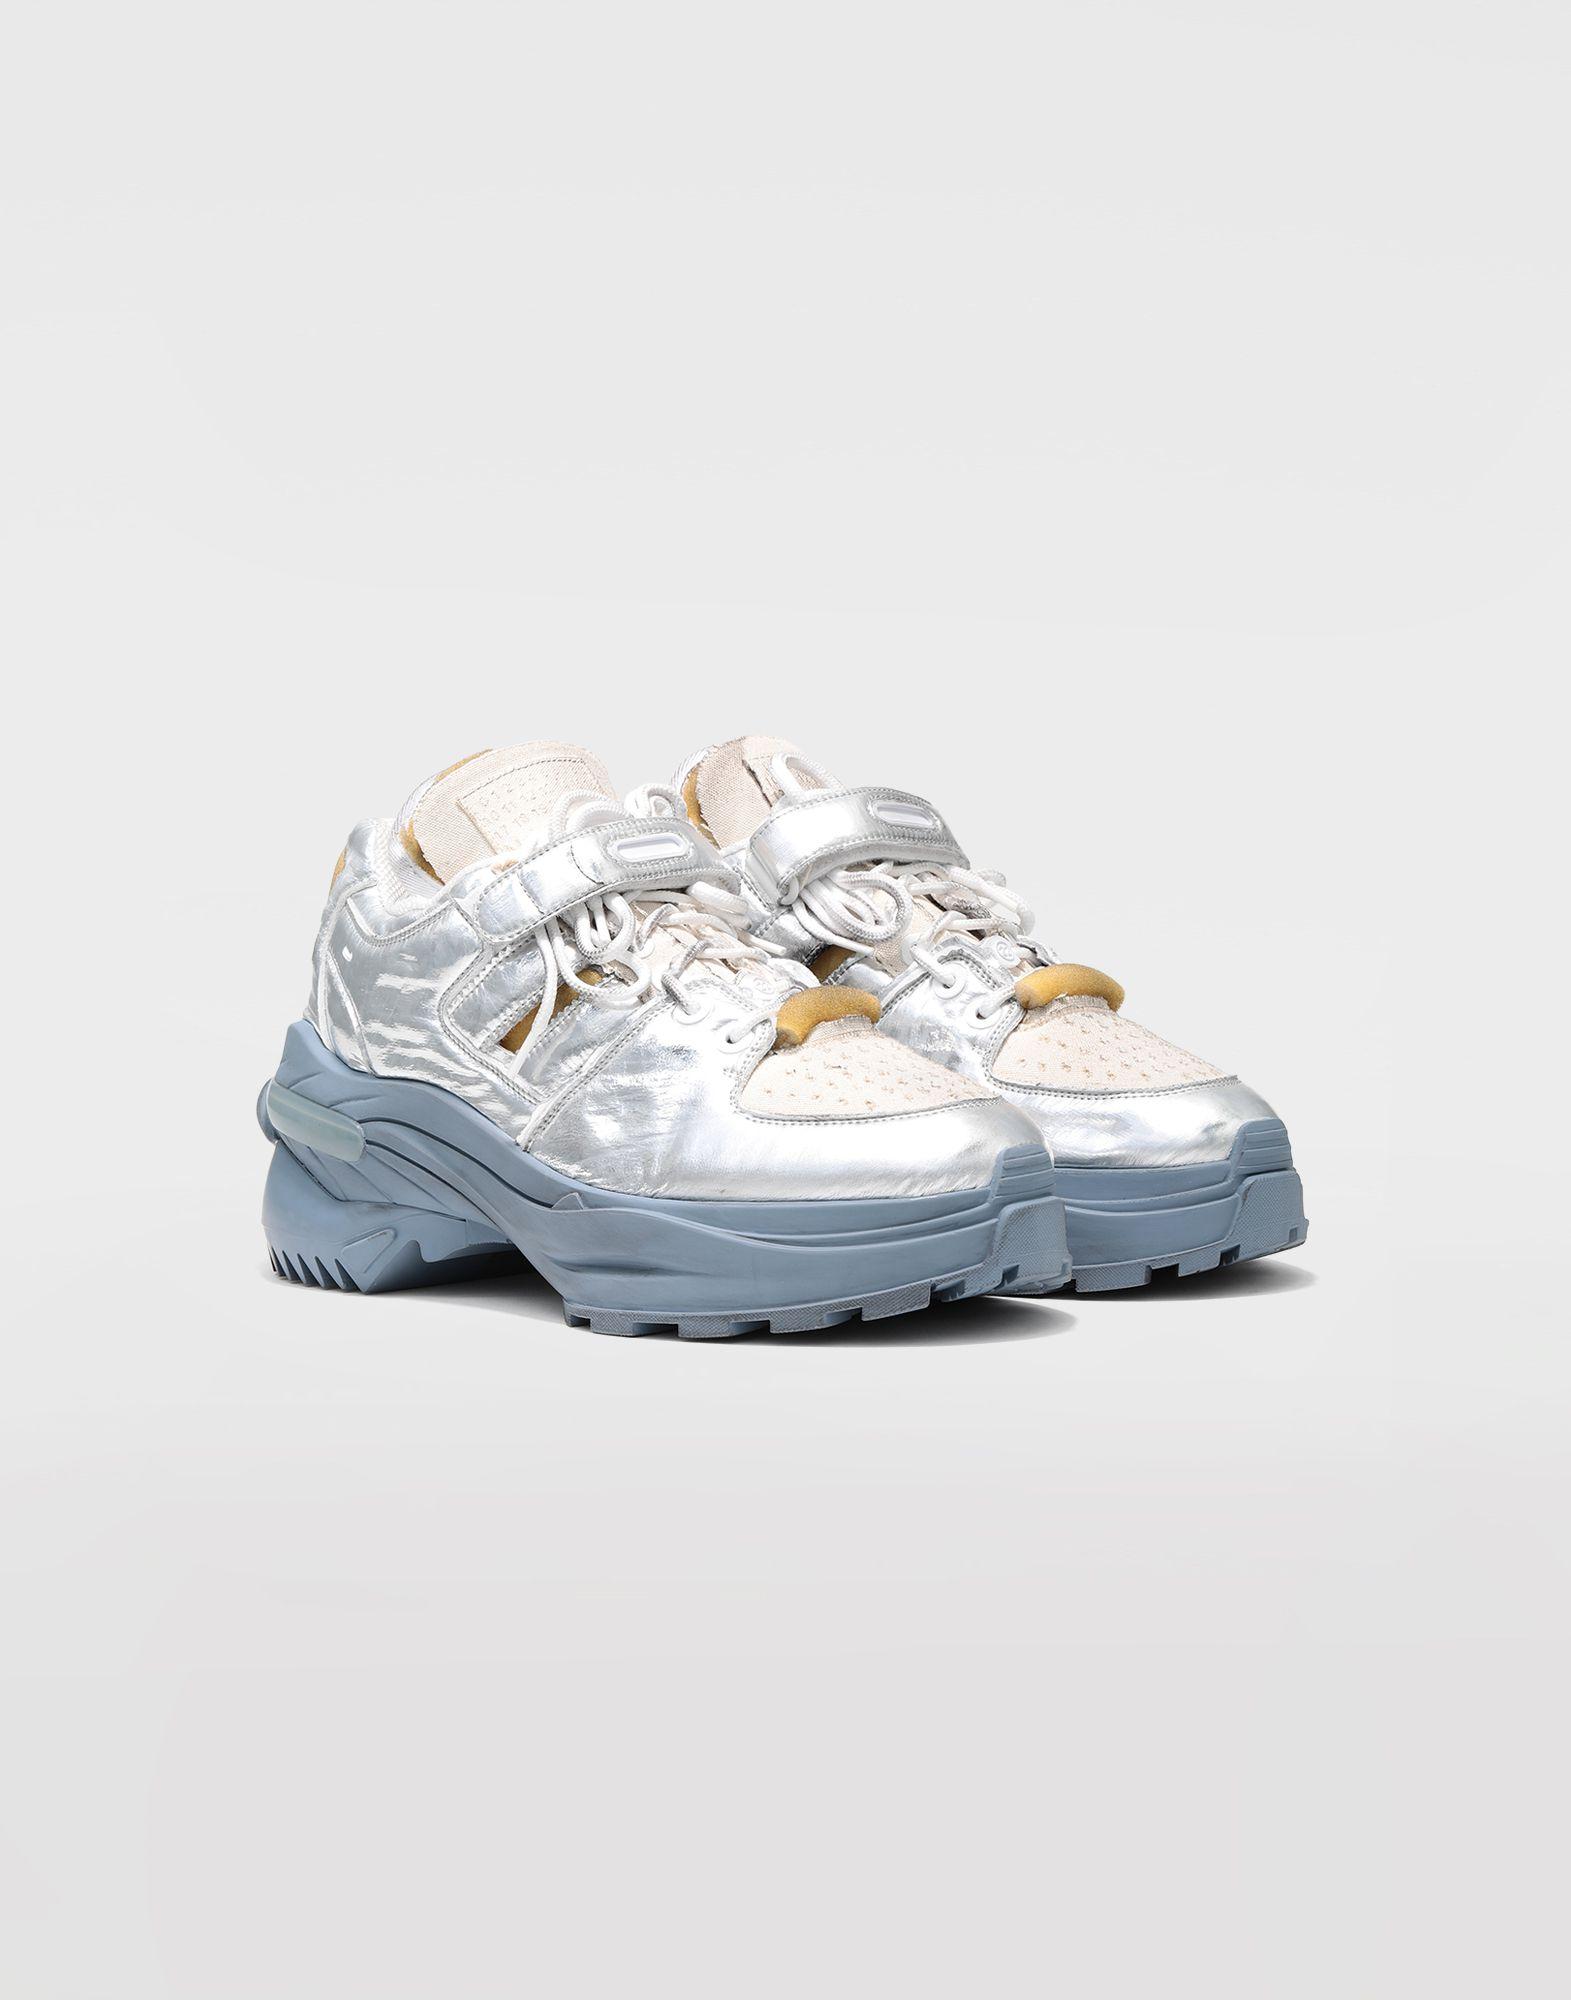 MAISON MARGIELA Retro Fit sneakers Sneakers Man d